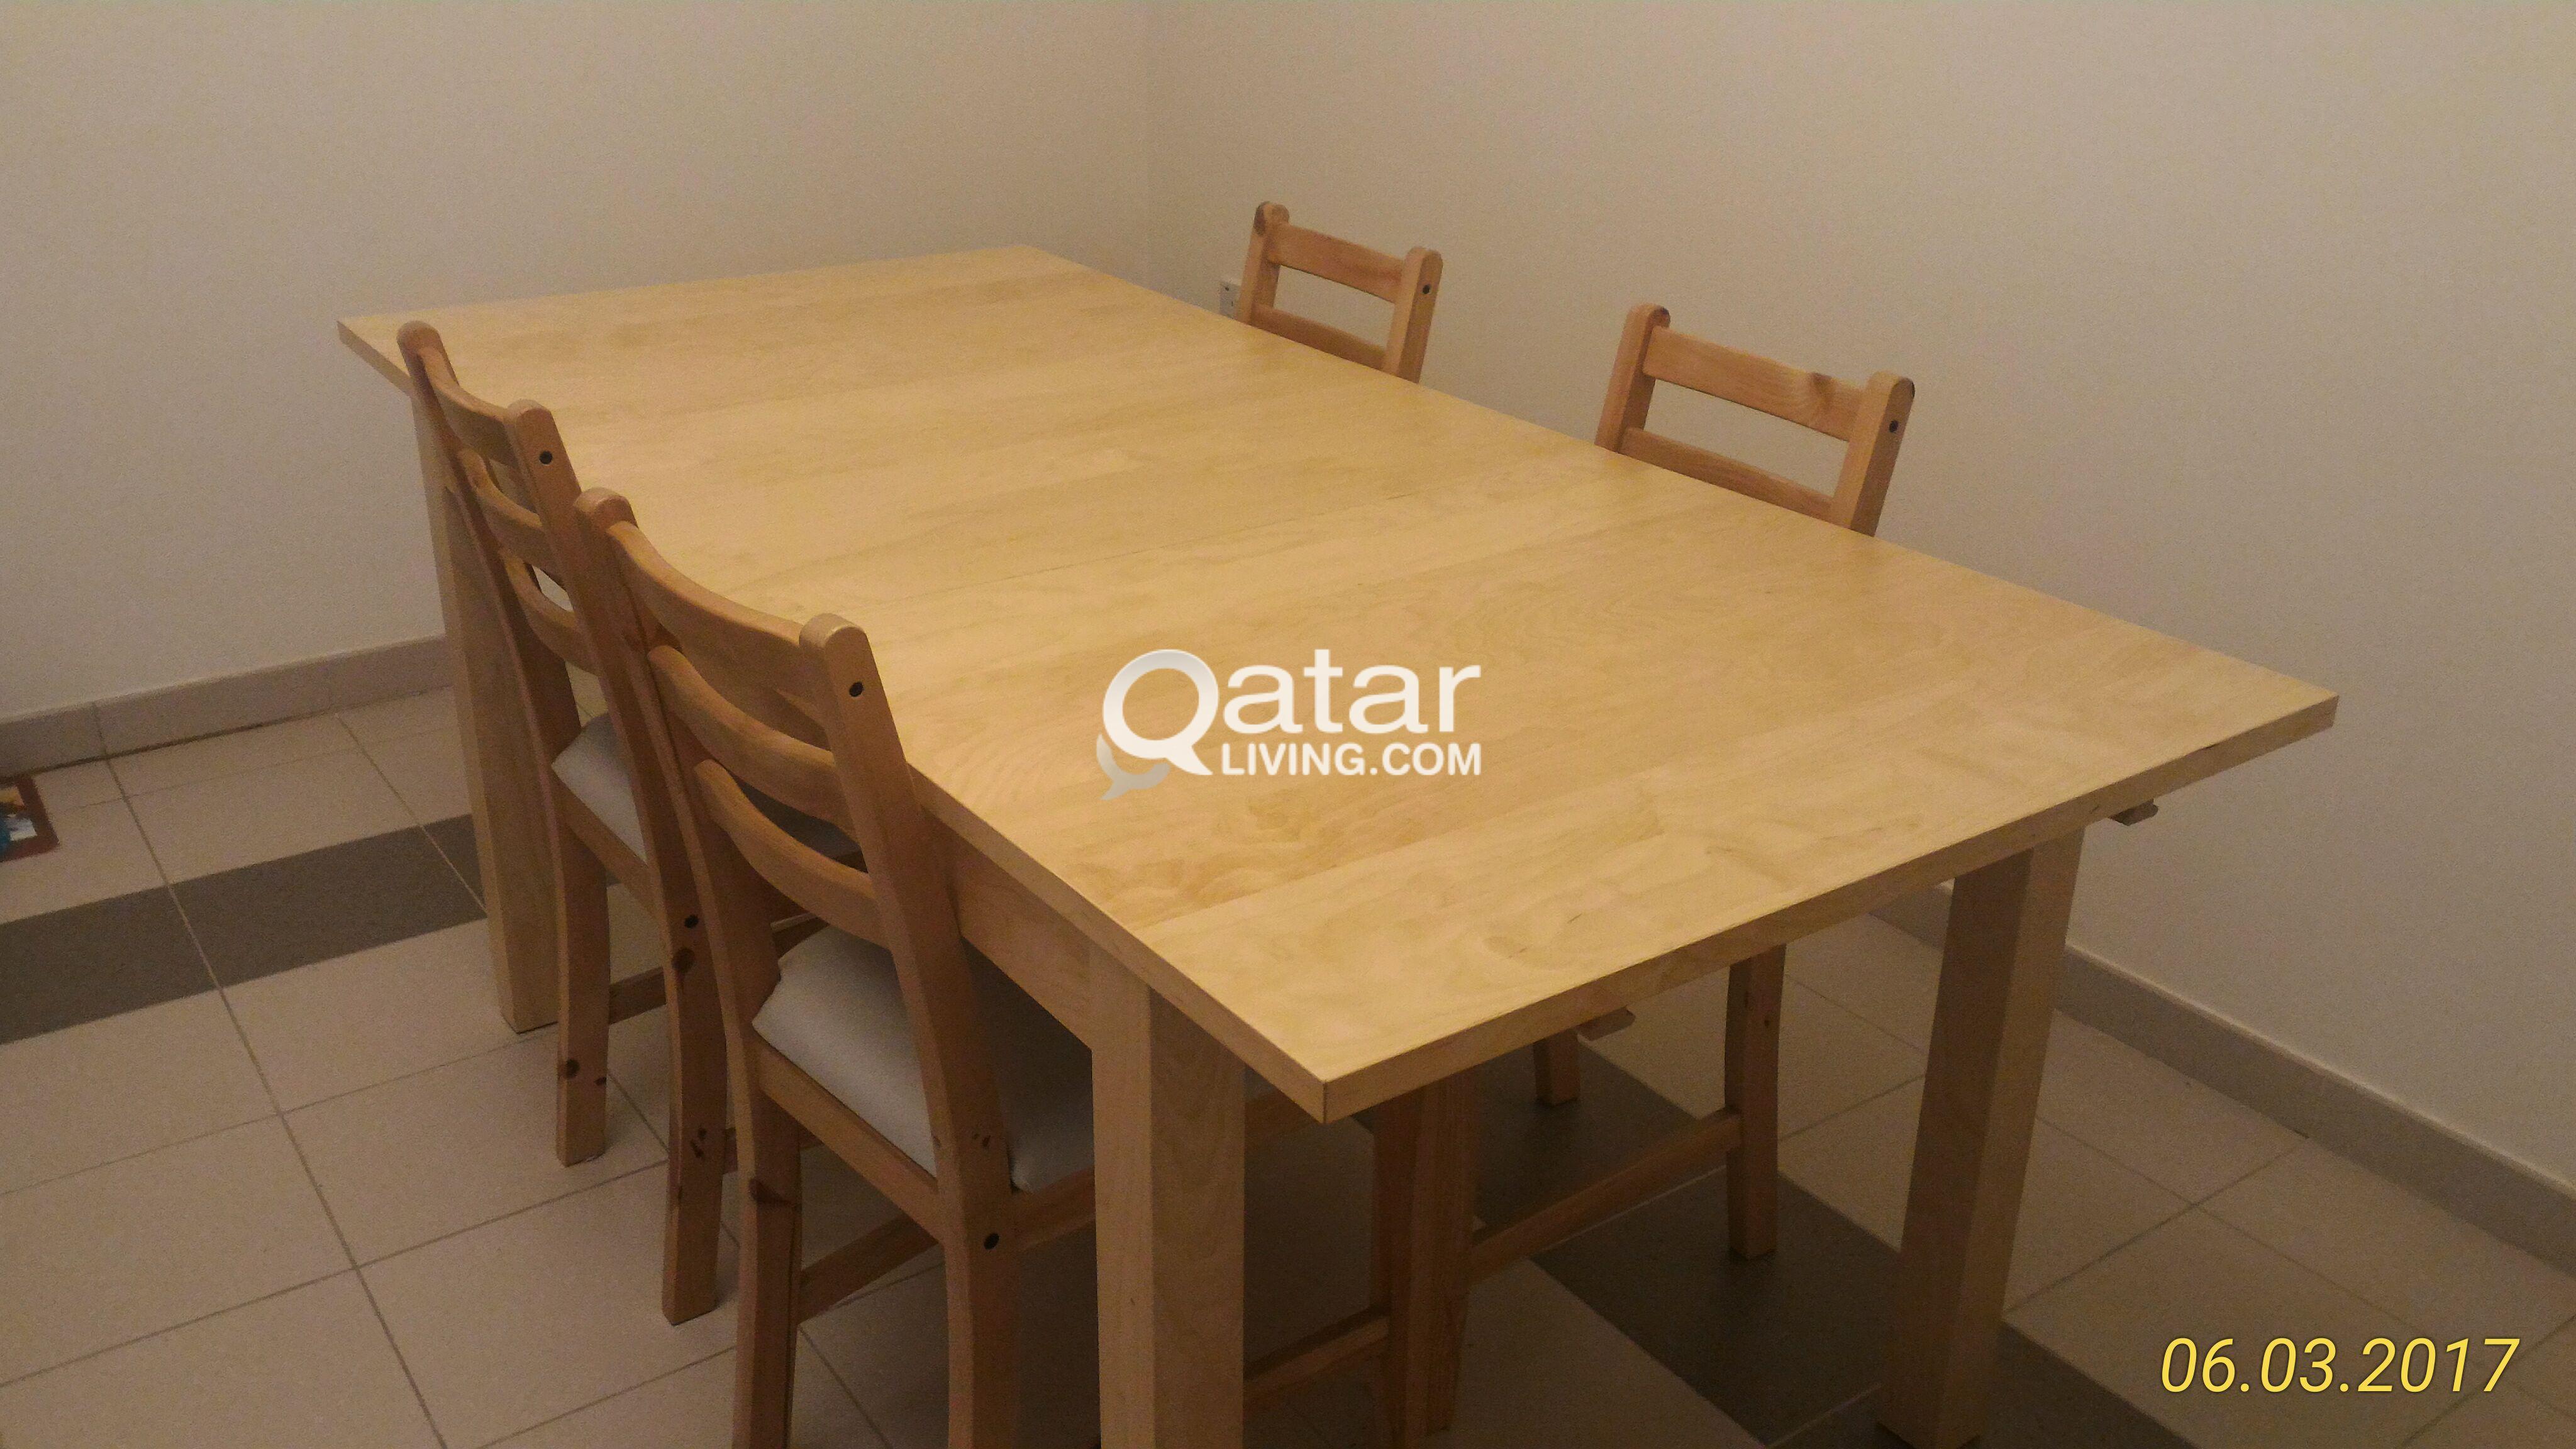 Ikea Stornas Dining Table Qatar Living